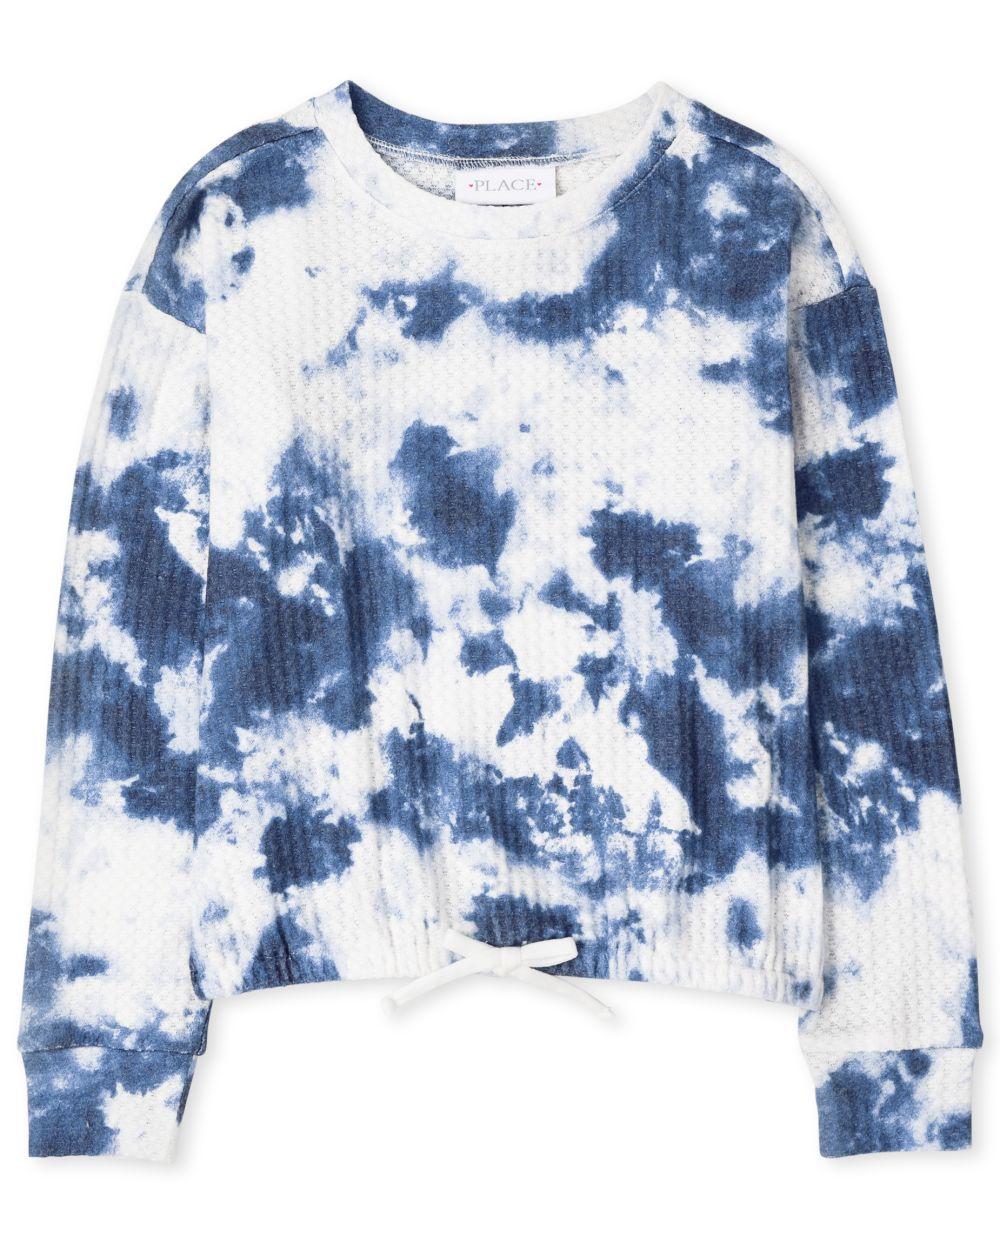 Girls Tie Dye Tie Front Thermal Sweatshirt - Blue